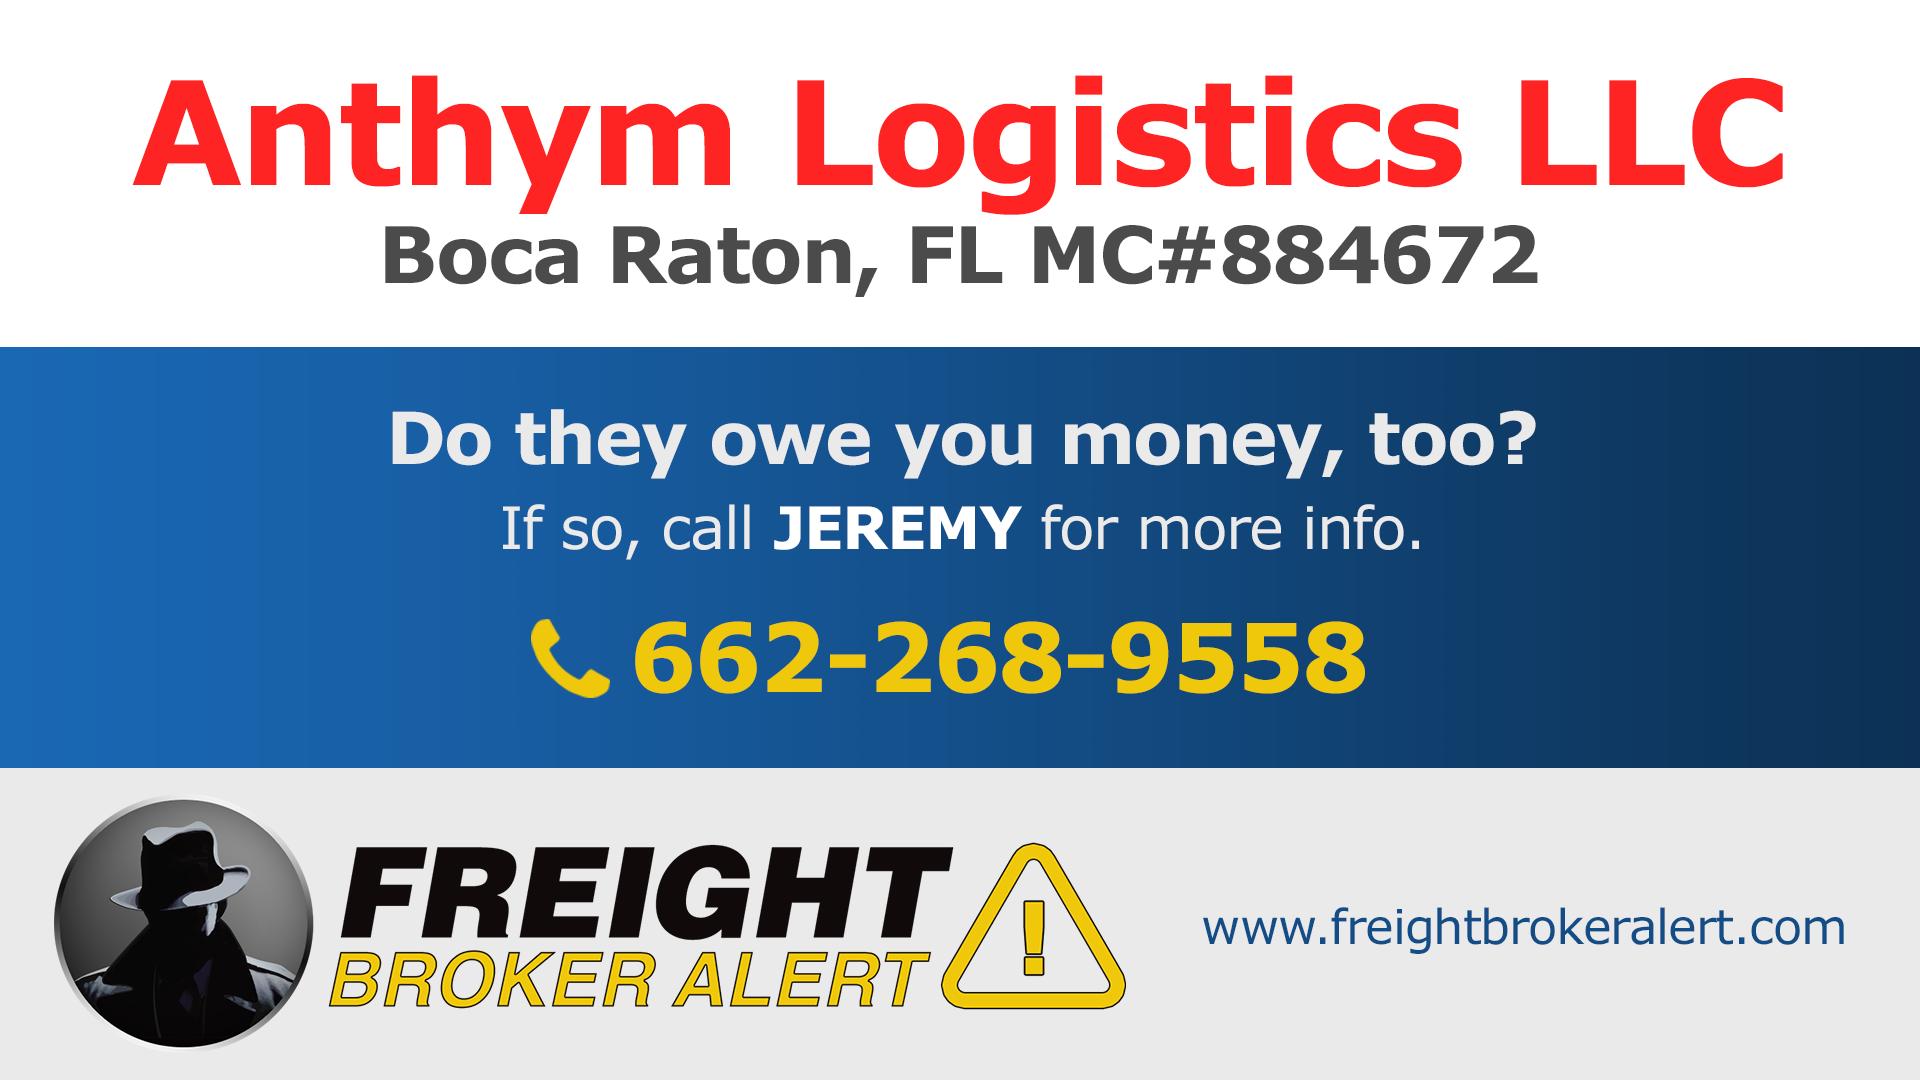 Anthym Logistics LLC Florida